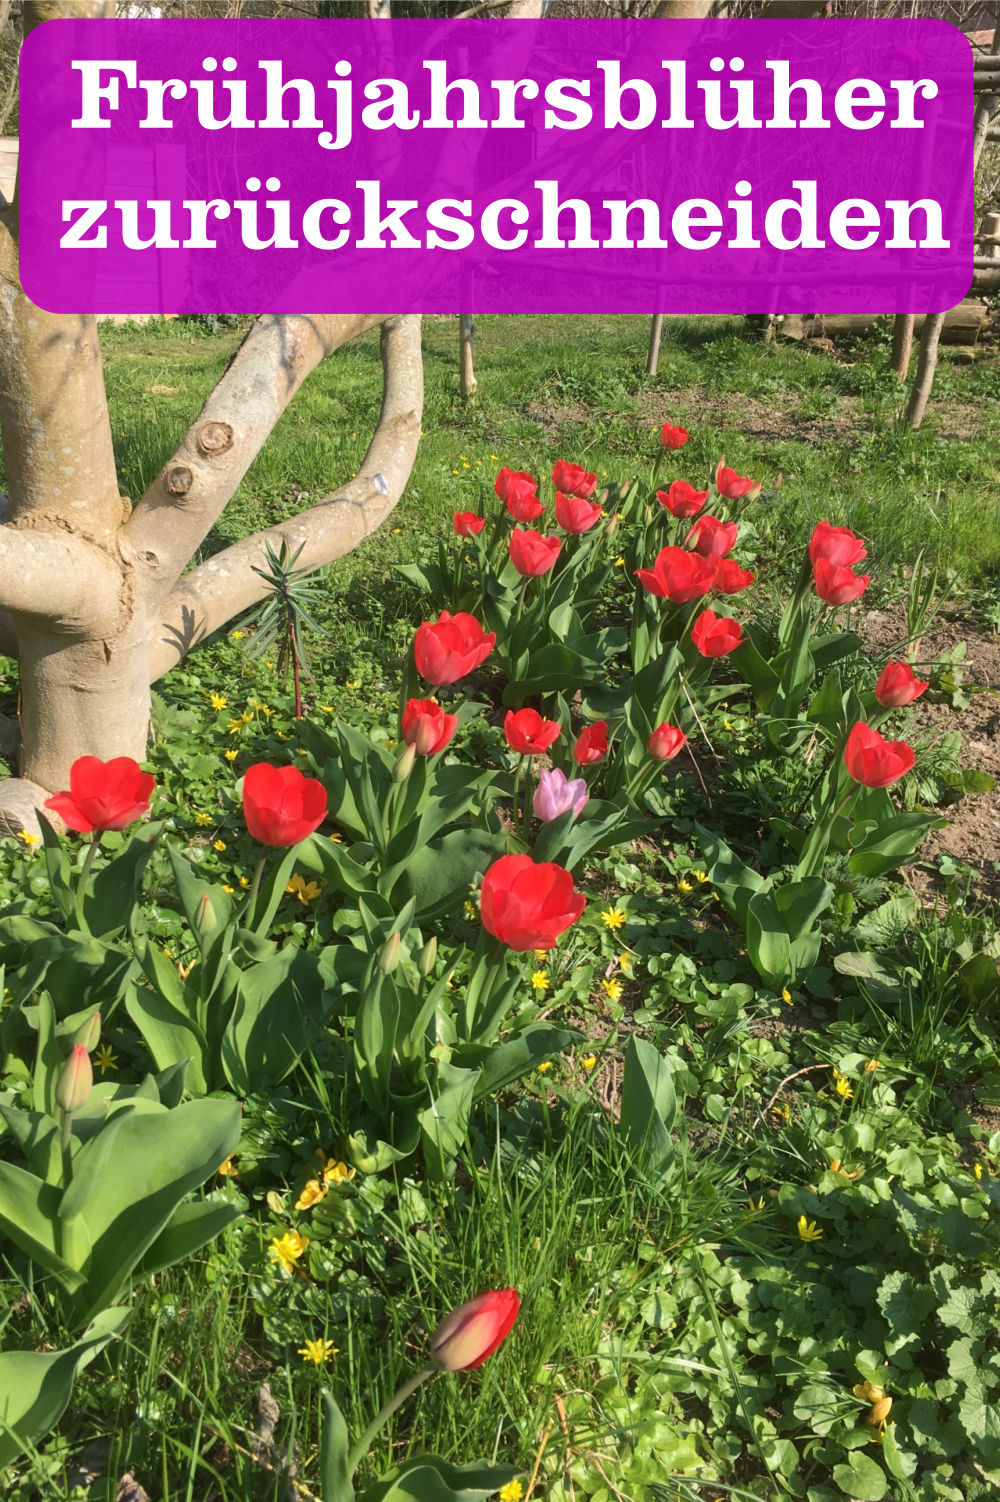 Frühjahrsblüher zurückschneiden